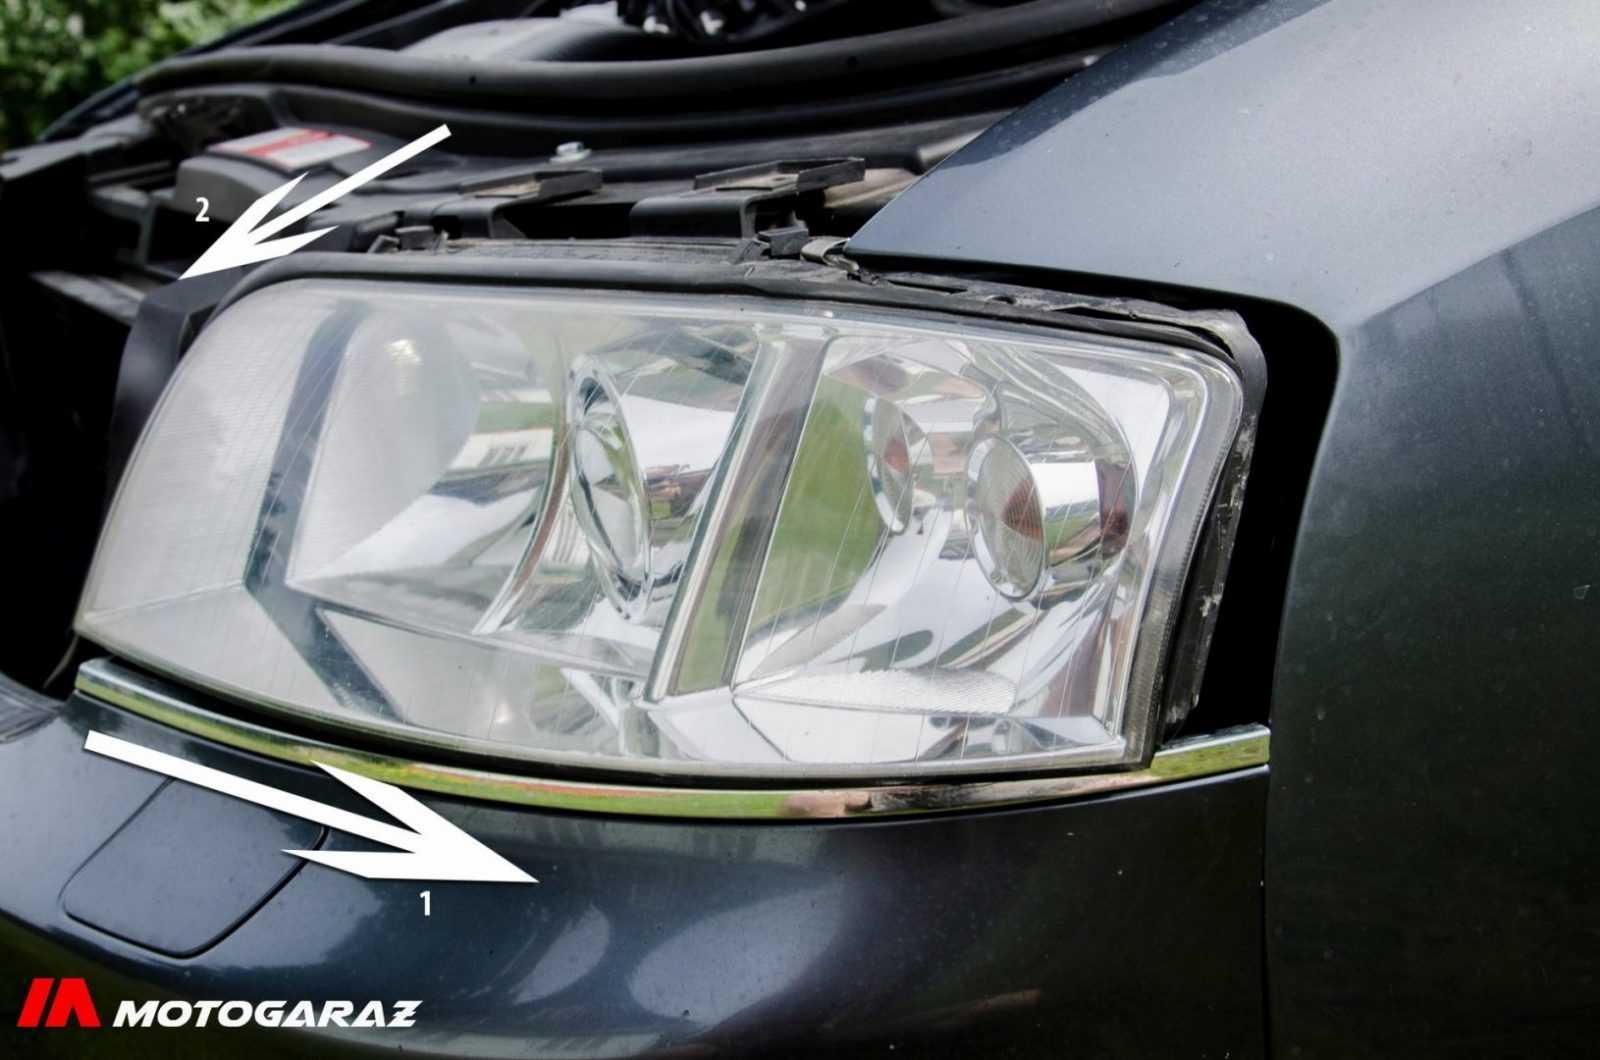 Wymiana lampy Audi a6c5 - fot. nr 8